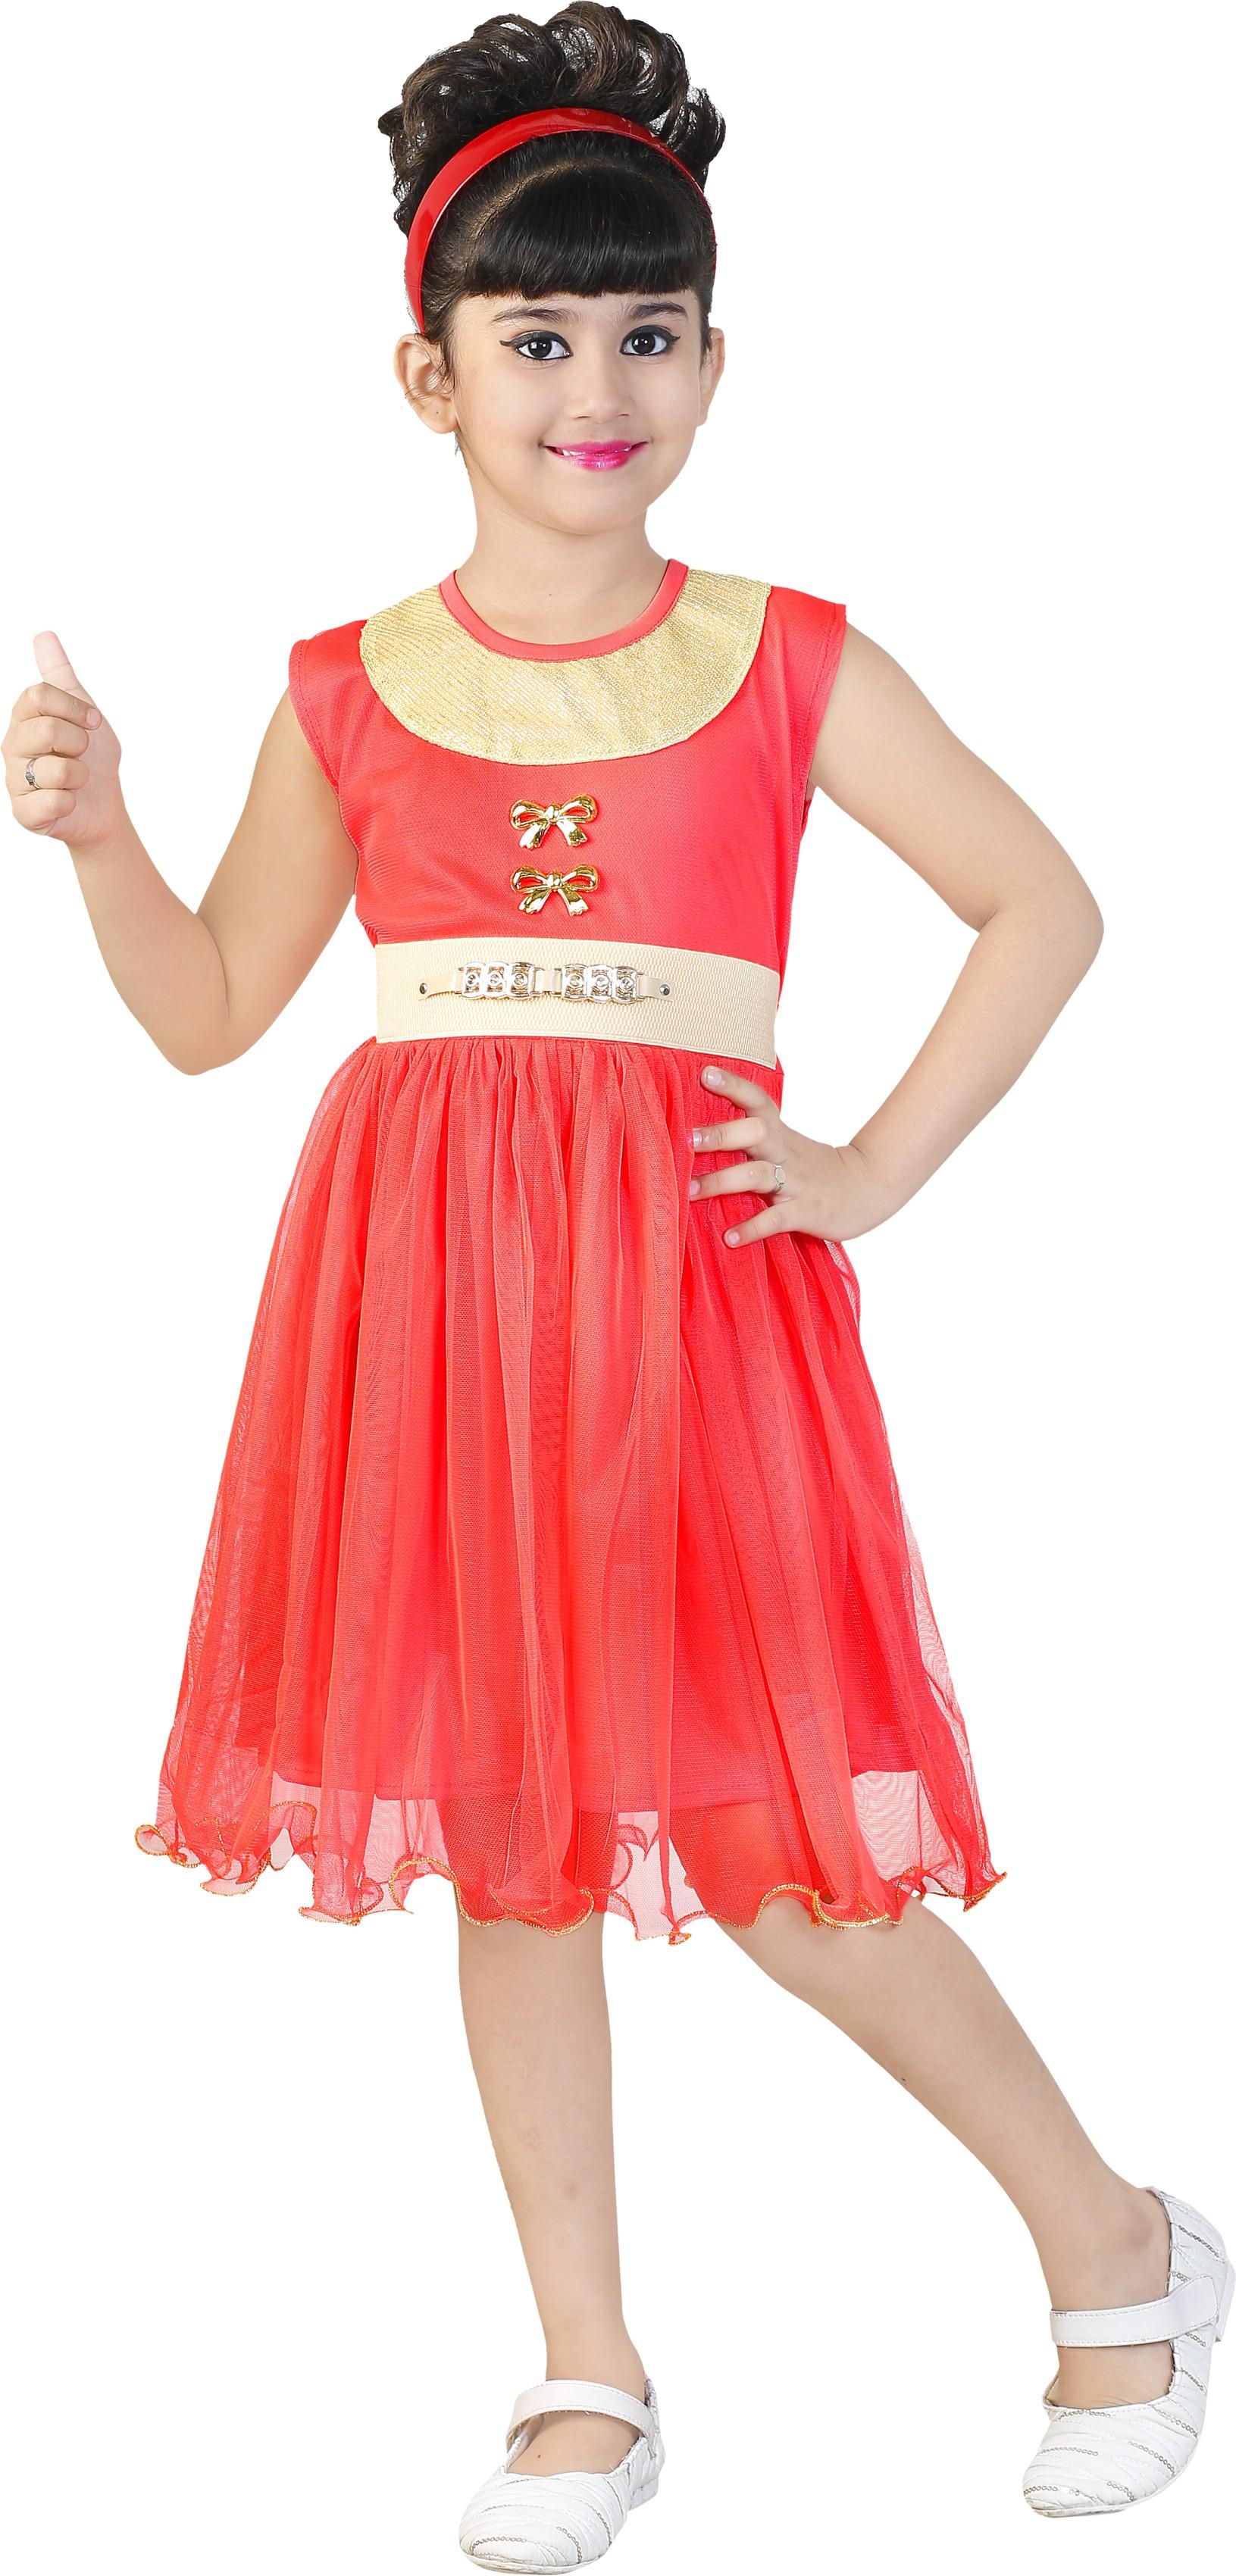 Deals - Bangalore - Kids Clothing <br> Lil Orchids, Gkidz, Sini Mini...<br> Category - clothing<br> Business - Flipkart.com